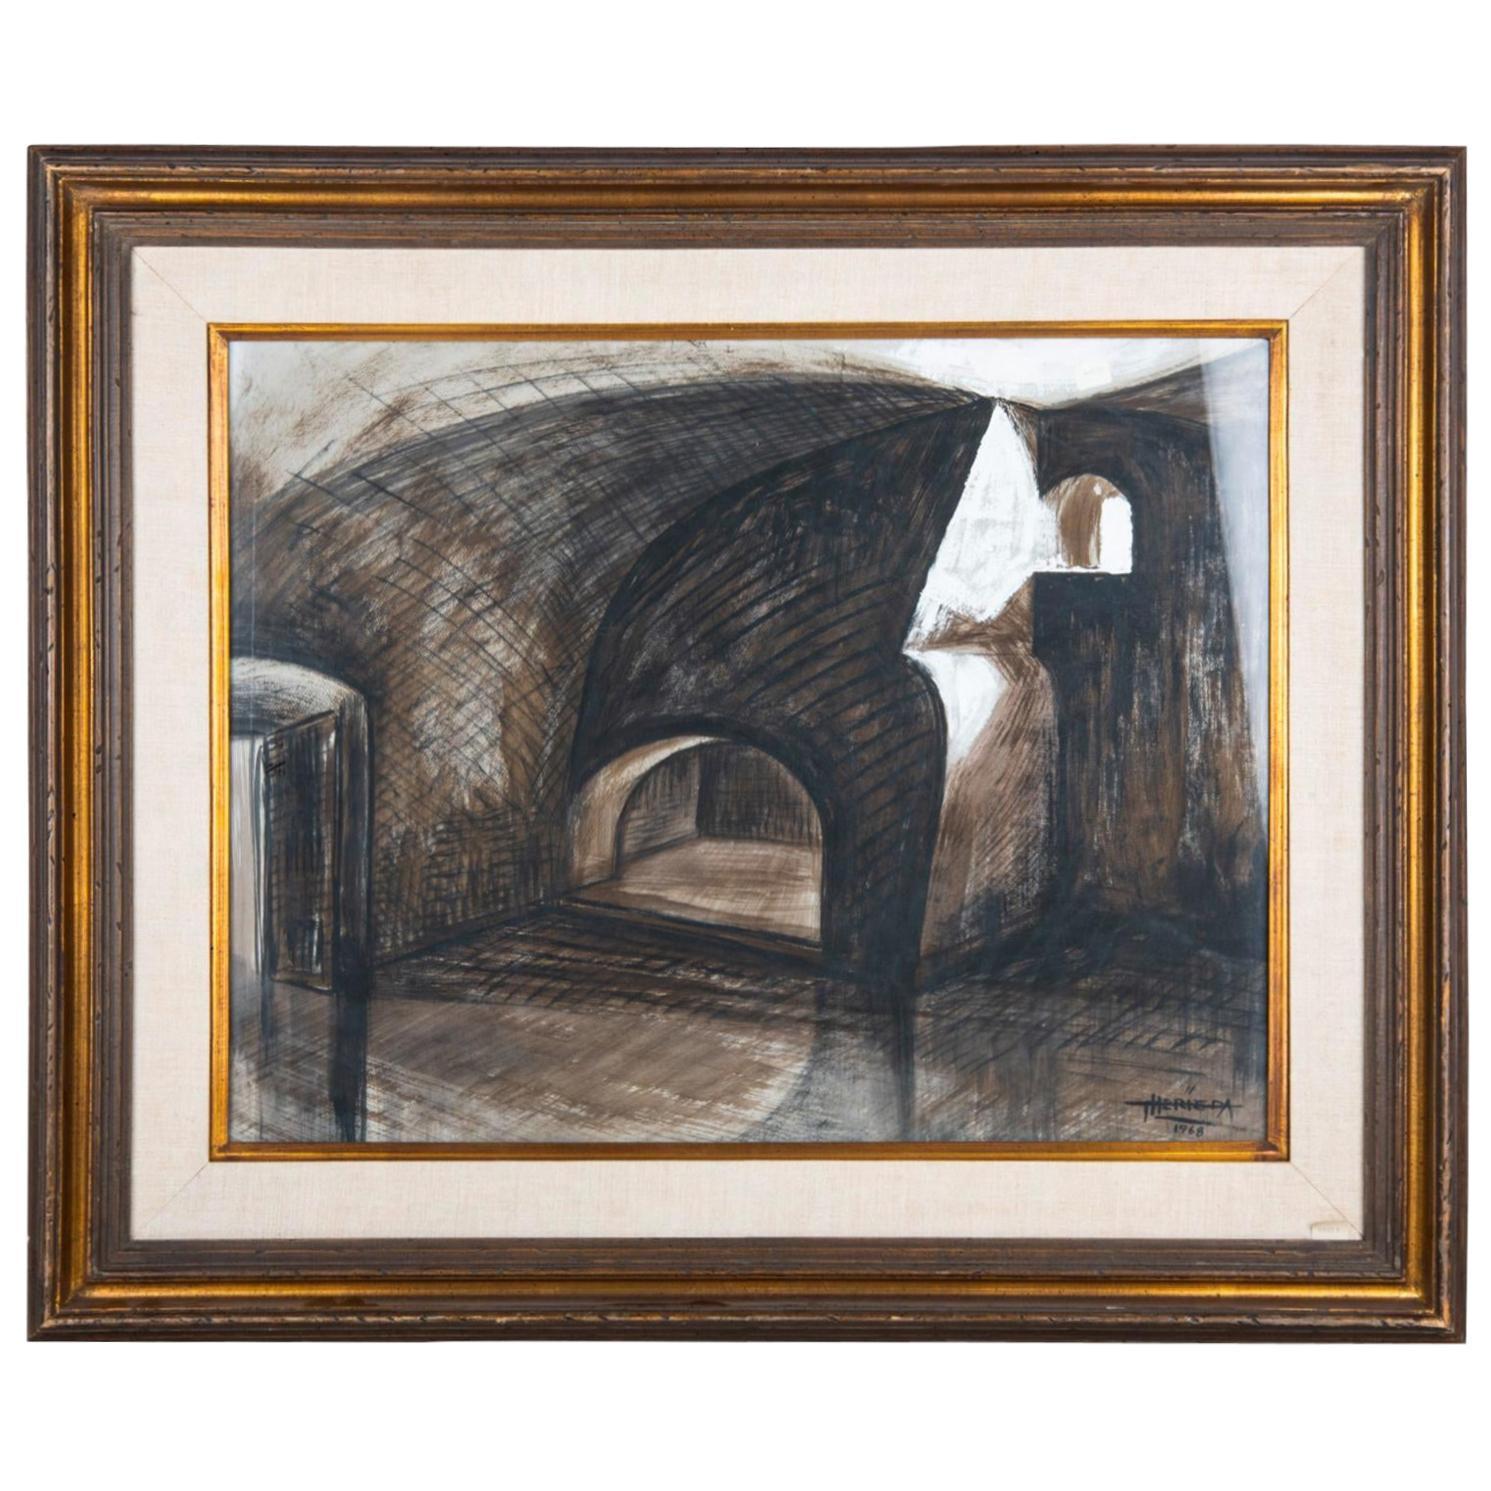 """Vaulted Interior""."" Framed Gouache on Paper"